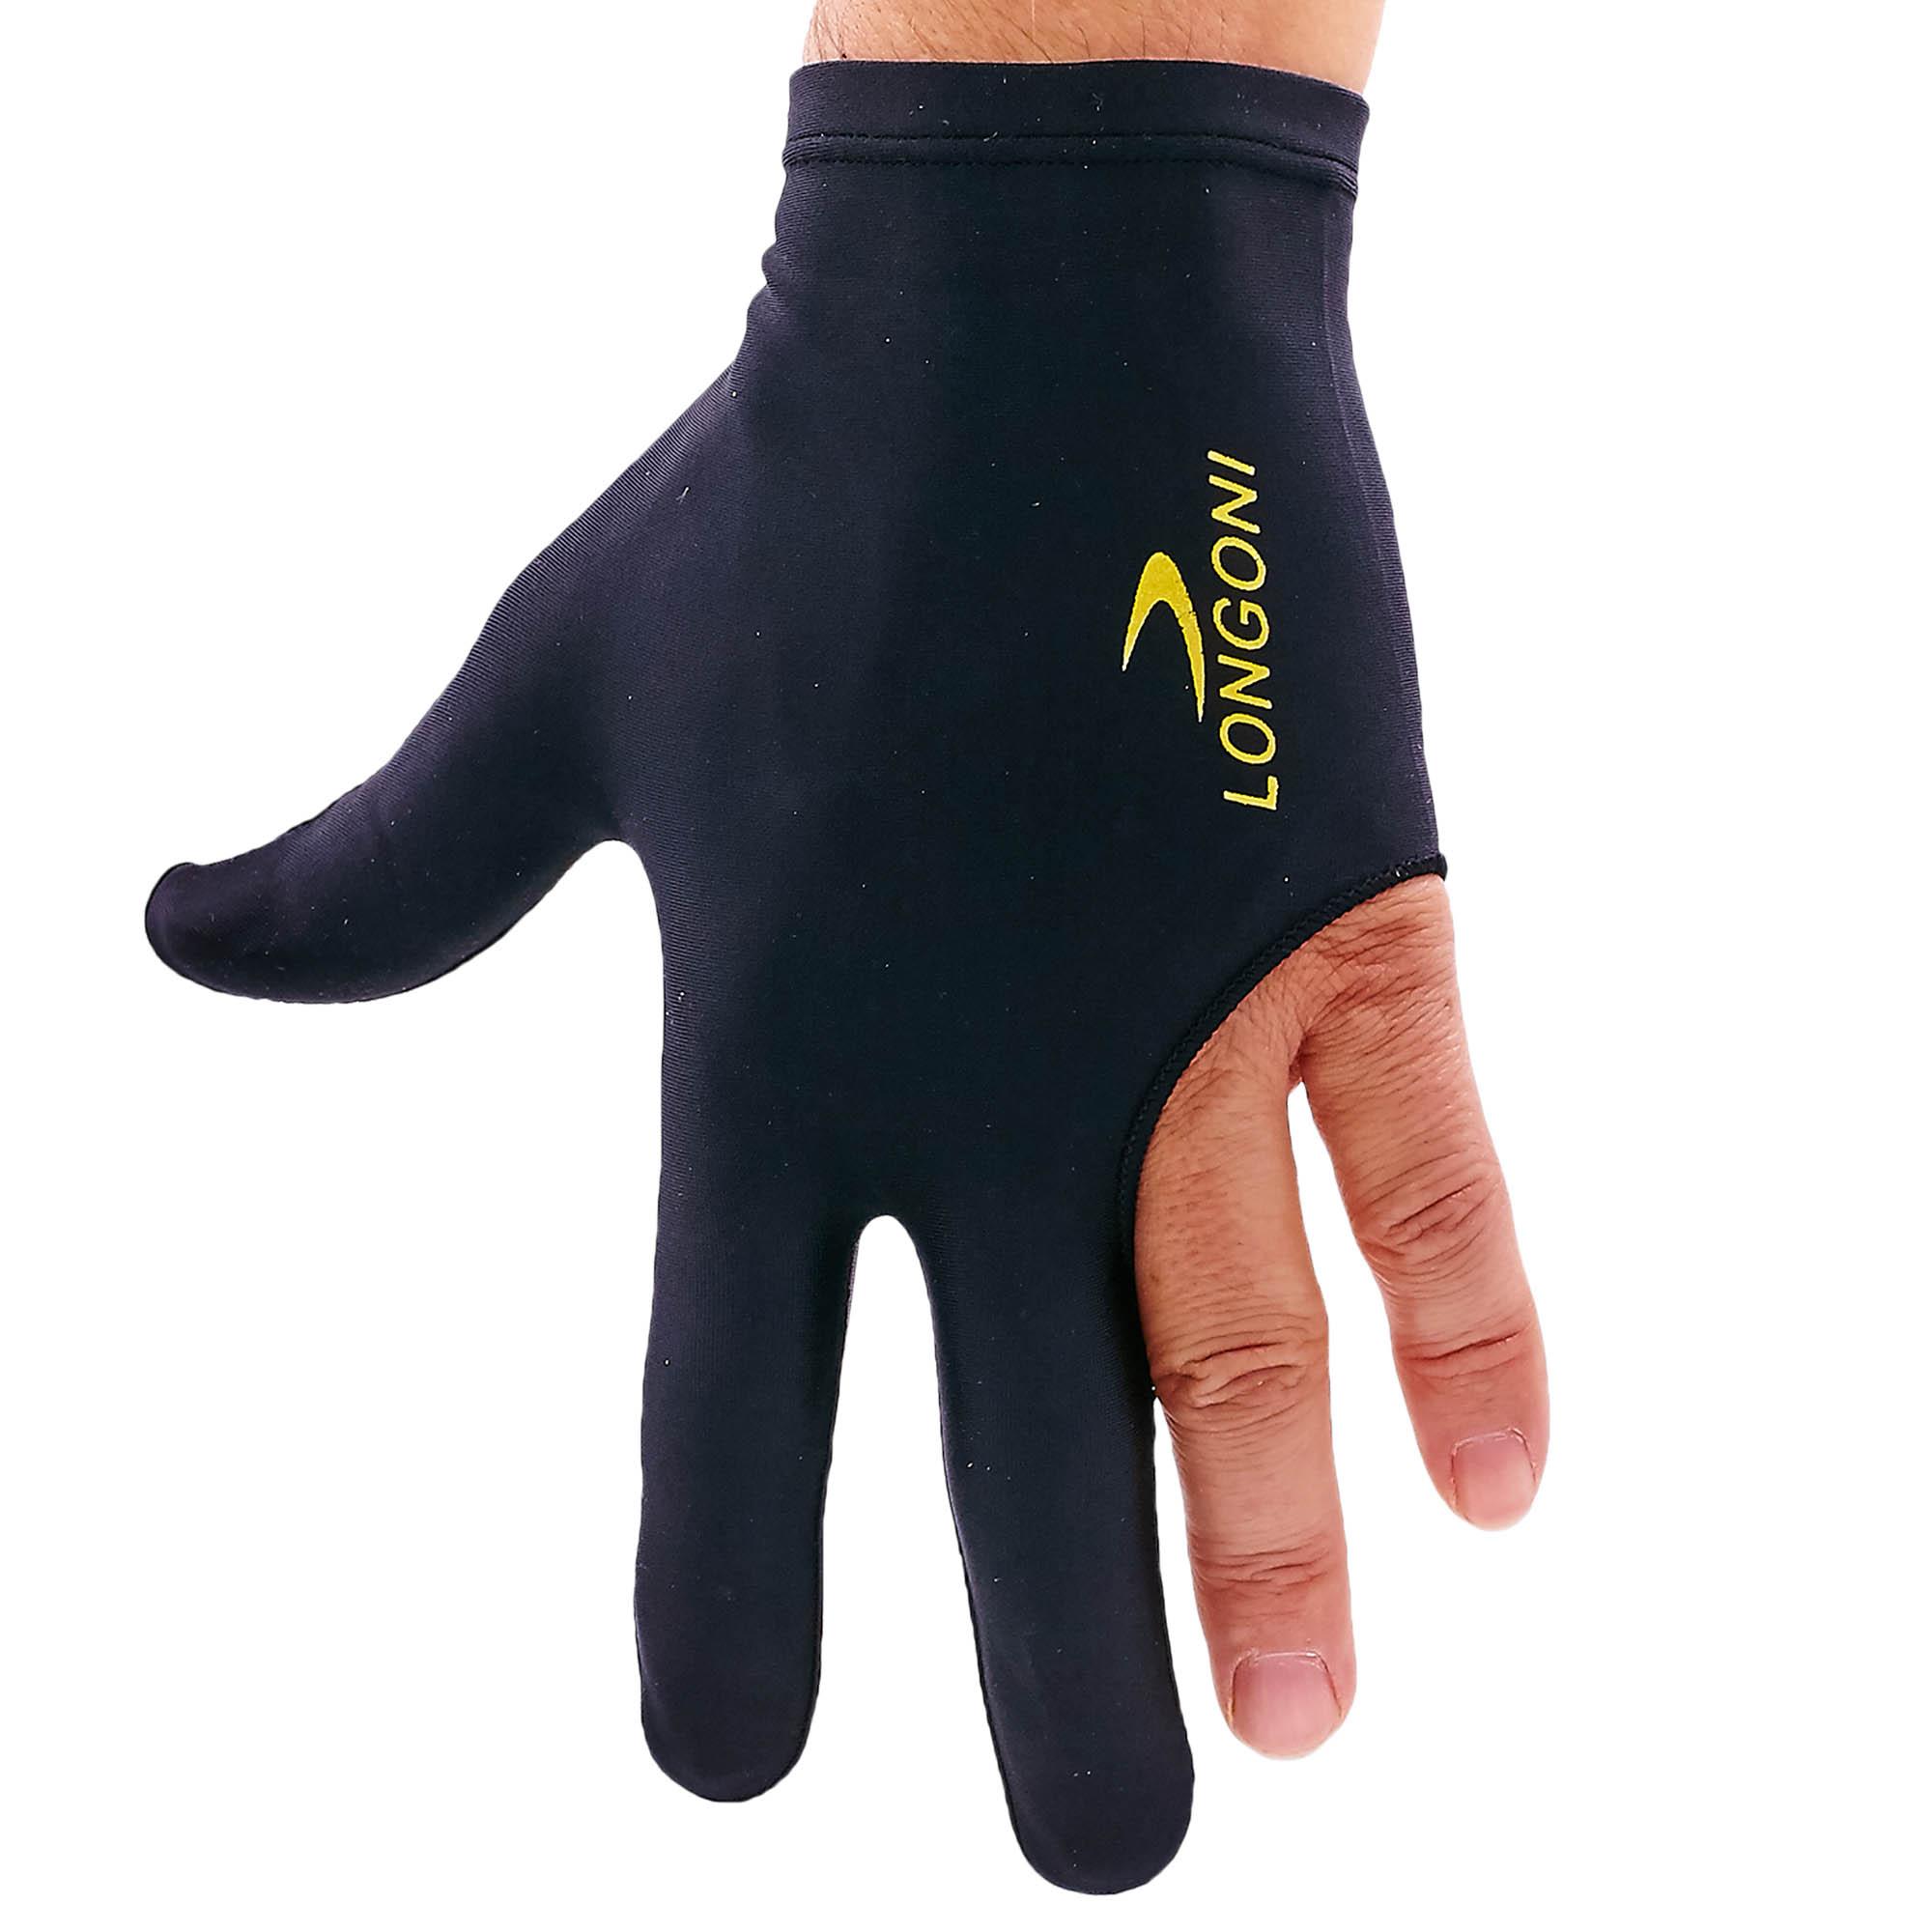 Перчатка бильярдная (1шт) (нейлон, эластан, черный, в уп.-2шт, цена за 1шт)